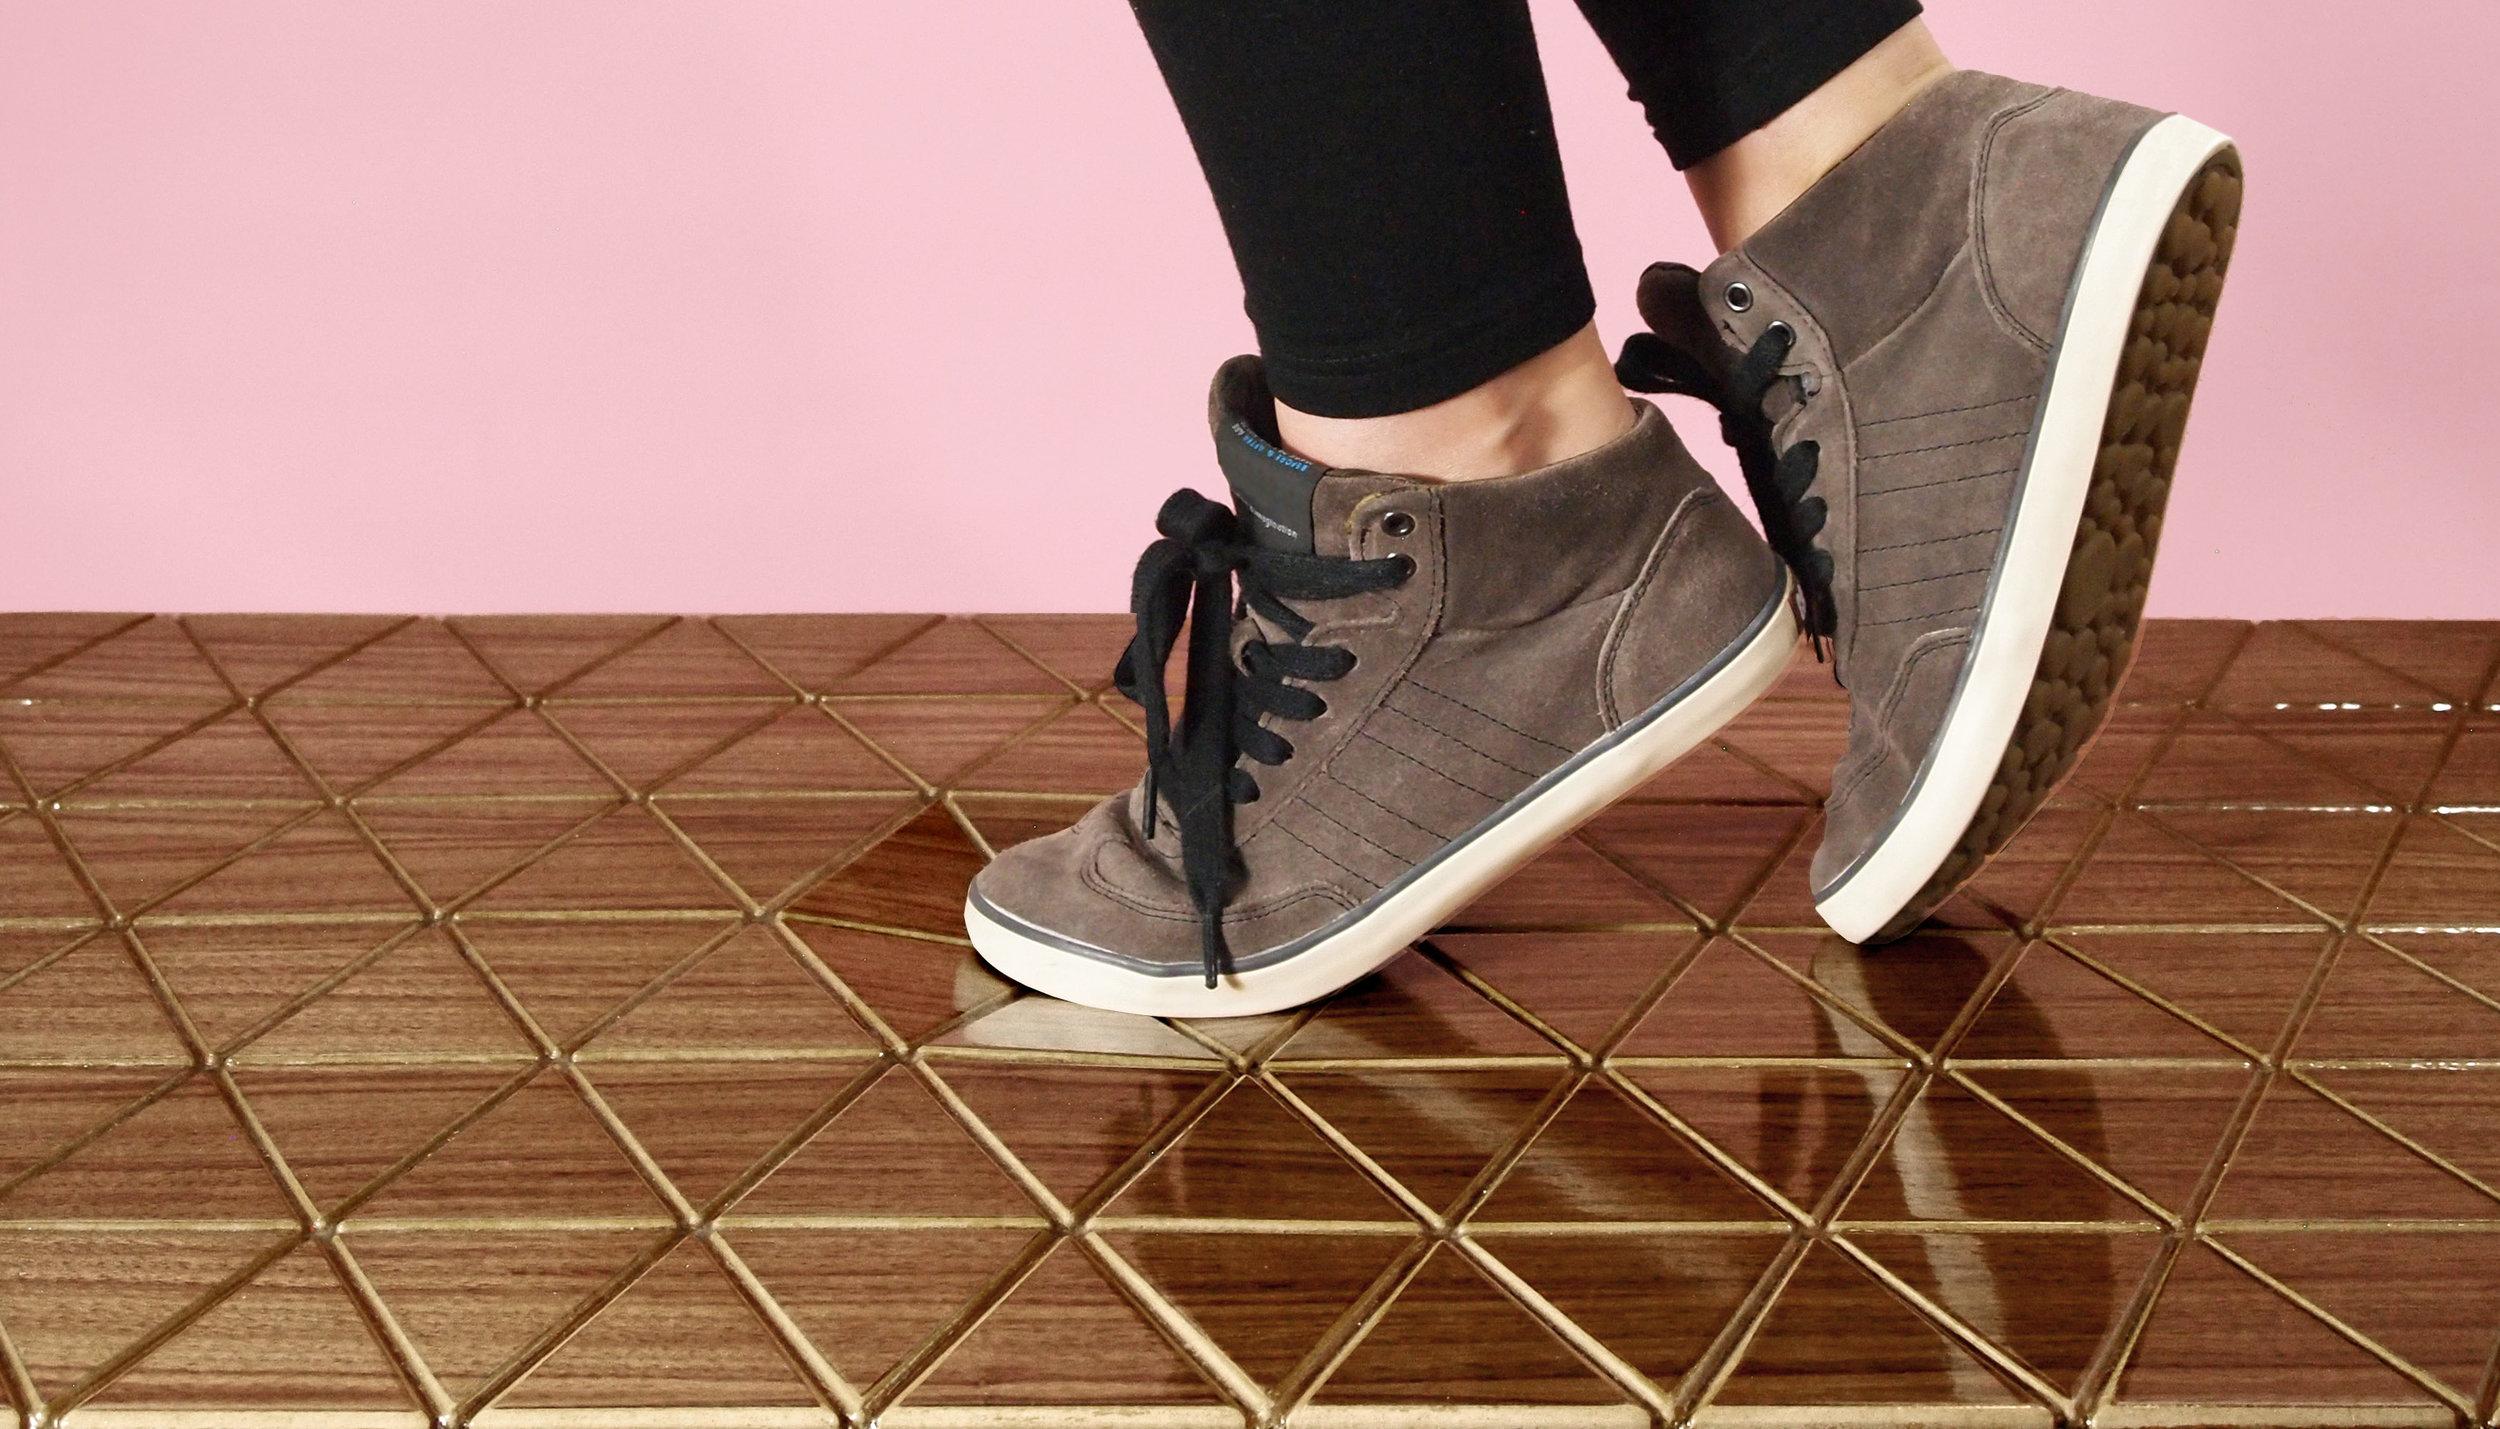 Airea Floor mat Walnut Dent Colored.jpg